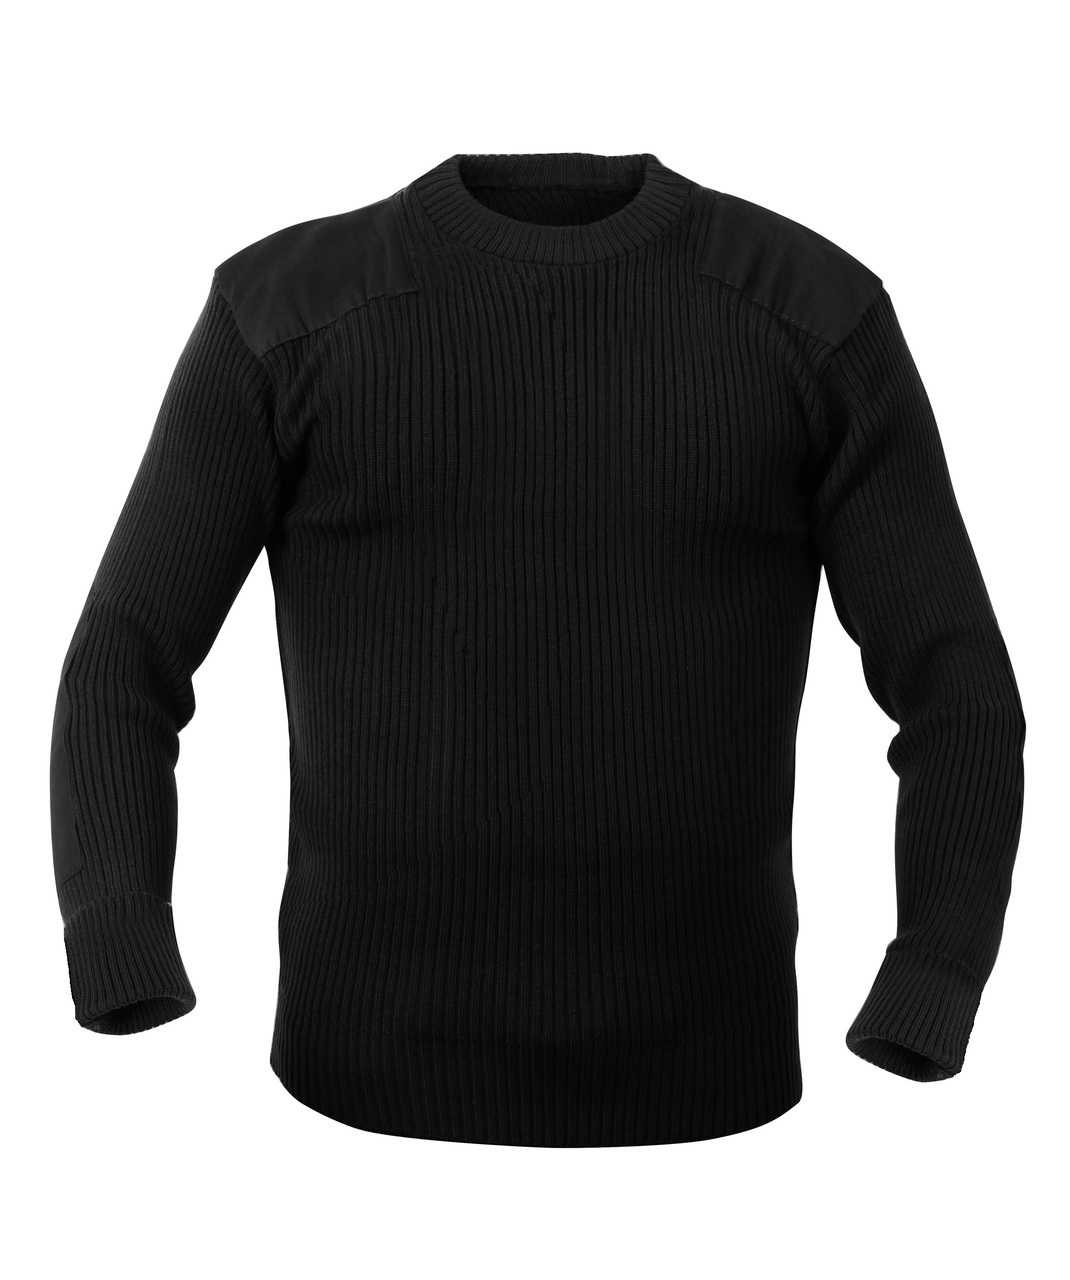 Parklands Commando Sweater - Crew Neck - Black